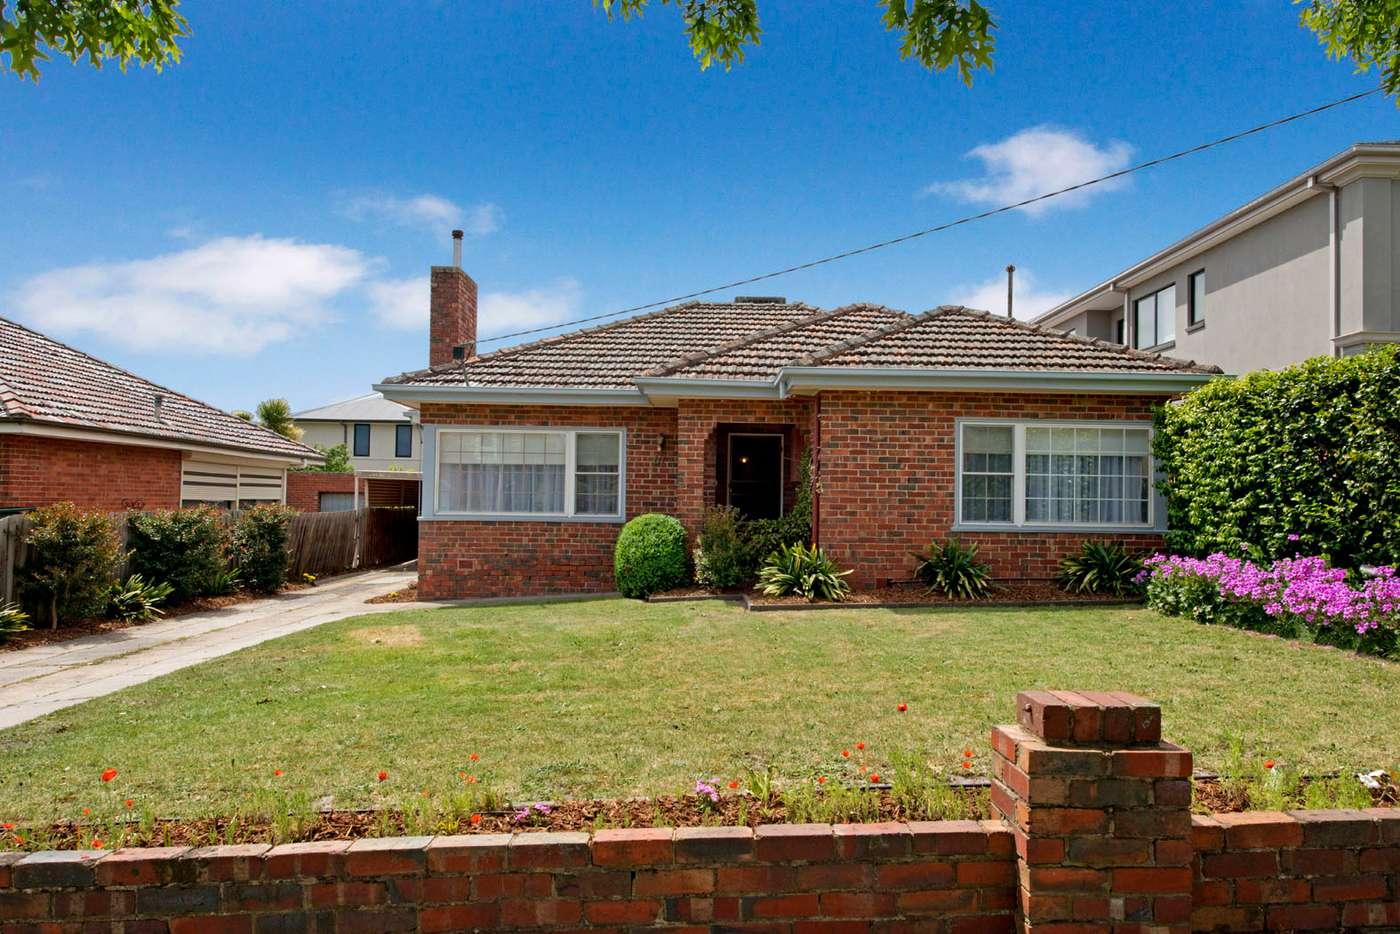 Main view of Homely house listing, 67 Liston Street, Glen Iris VIC 3146